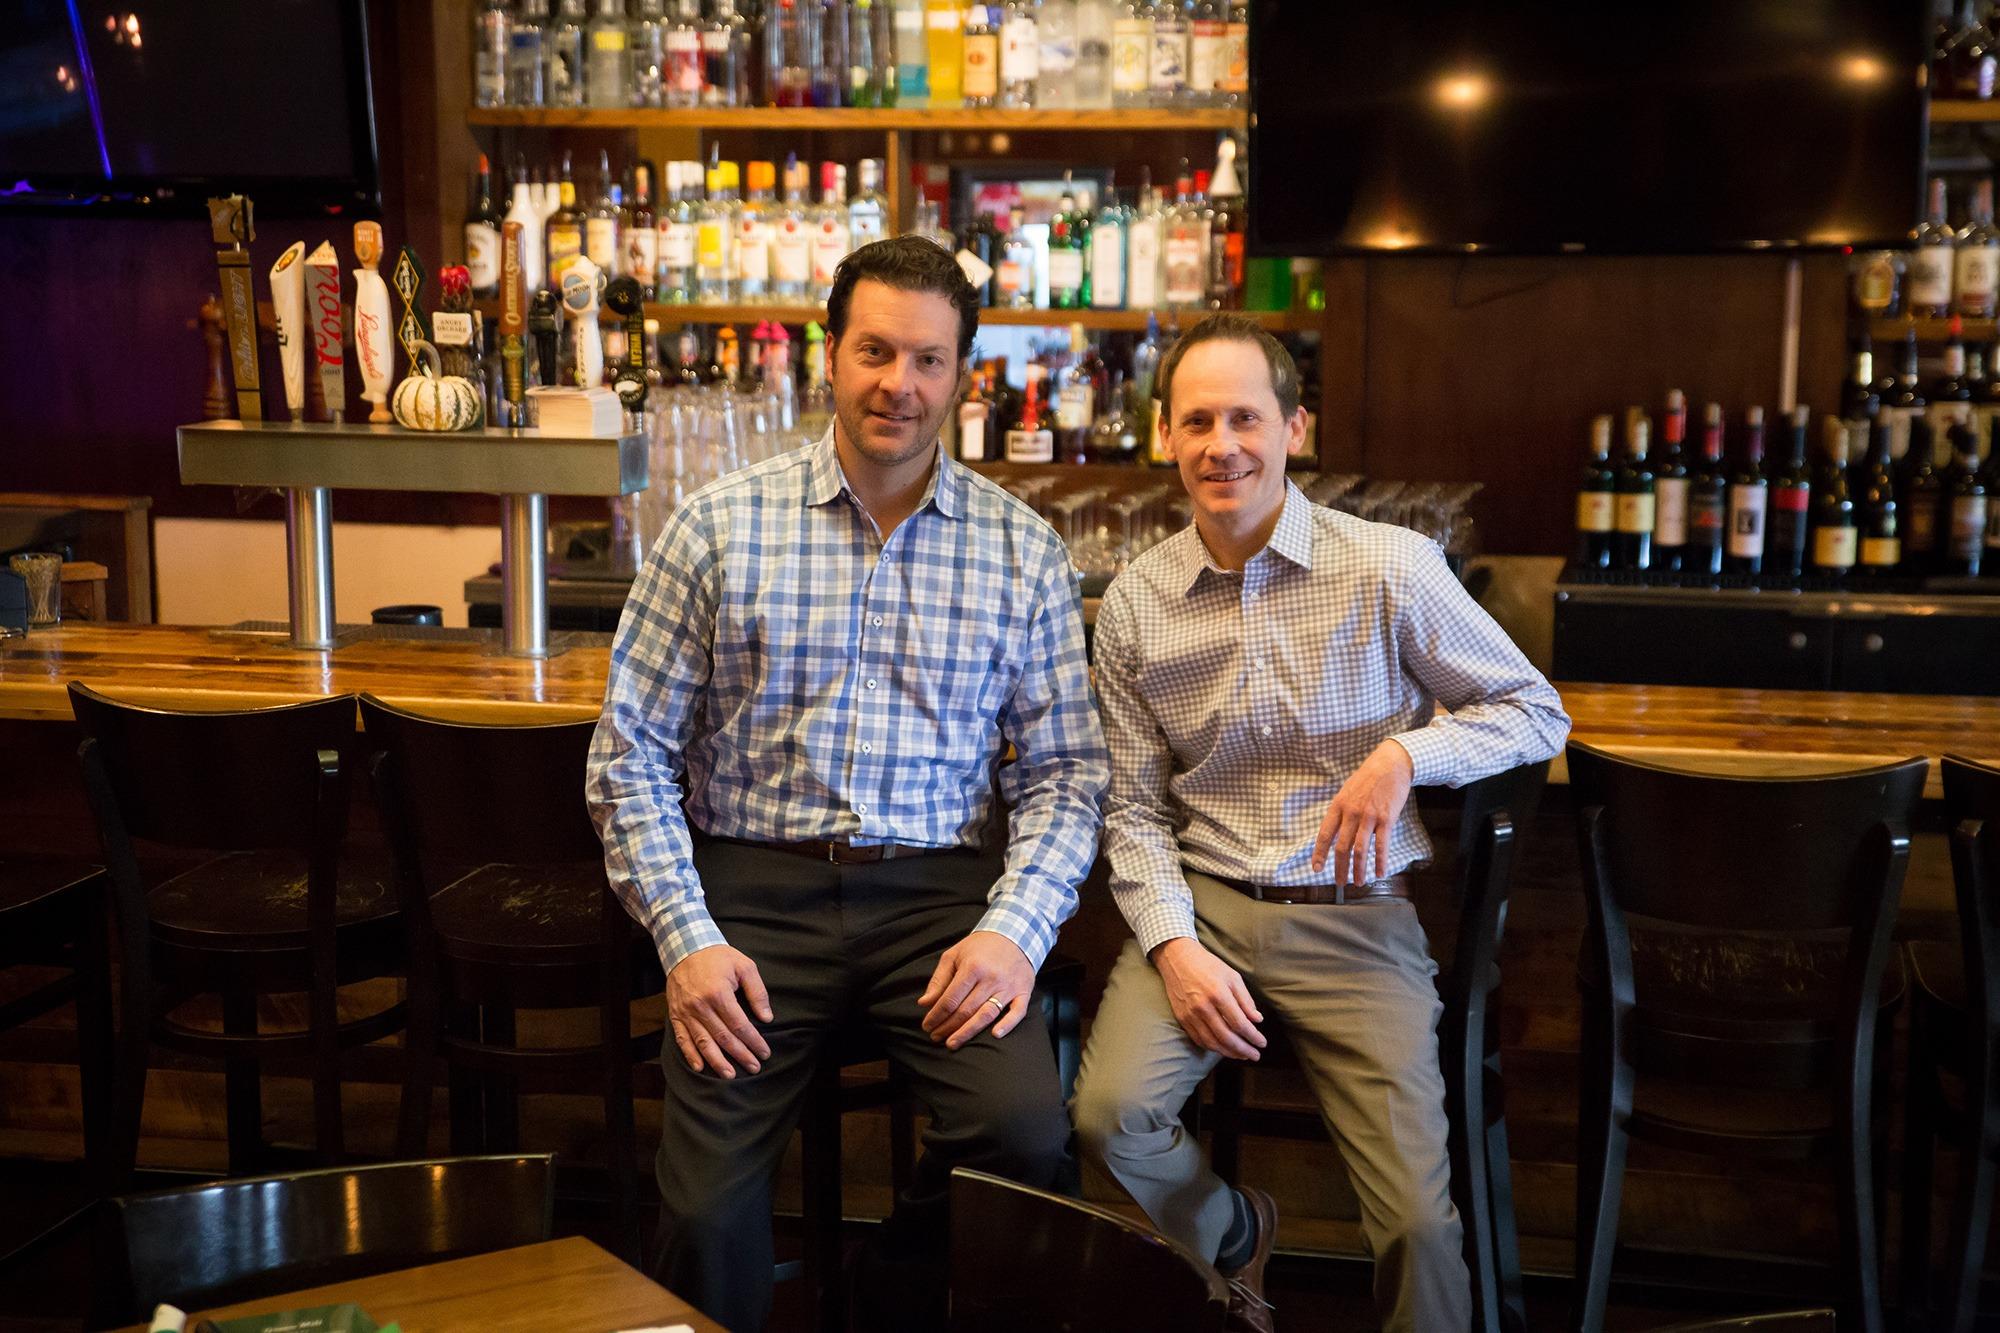 Image of: Paul Dzubnar, Hightop Hospitality Co-owner/Manager and Joe Bauer, Deerwood Bank Metro Market President.